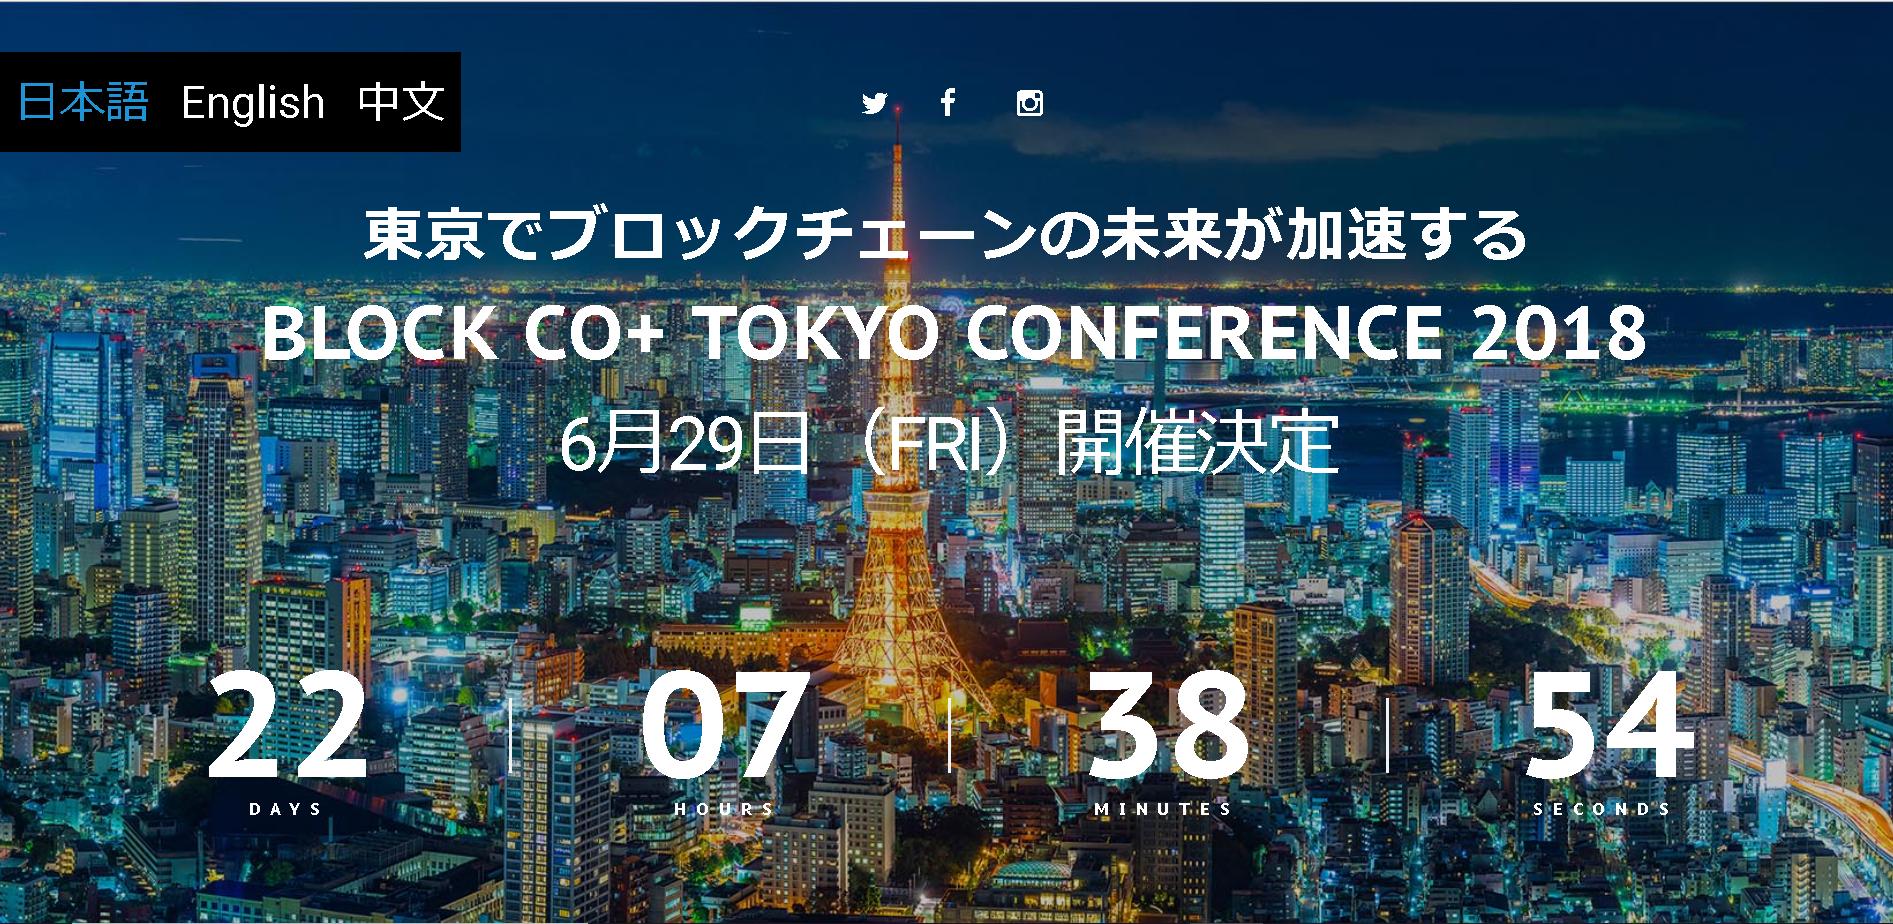 Block Co+ Tokyo2018アイキャッチ